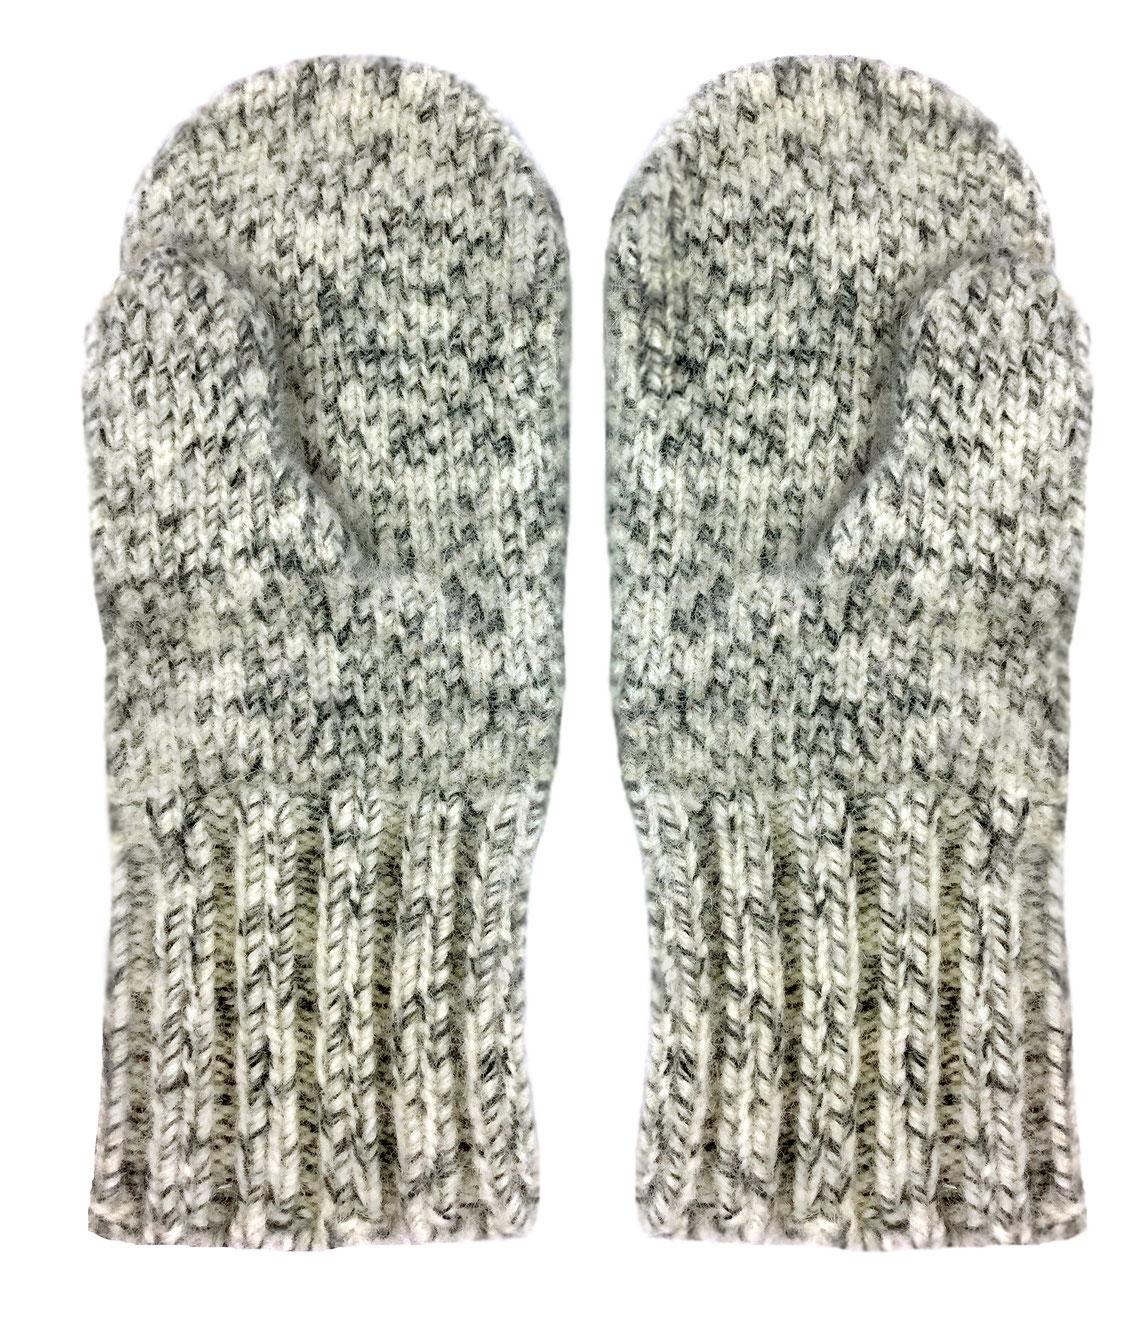 Dachstein Woolwear Boiled Wool Mittens - Sweater Chalet